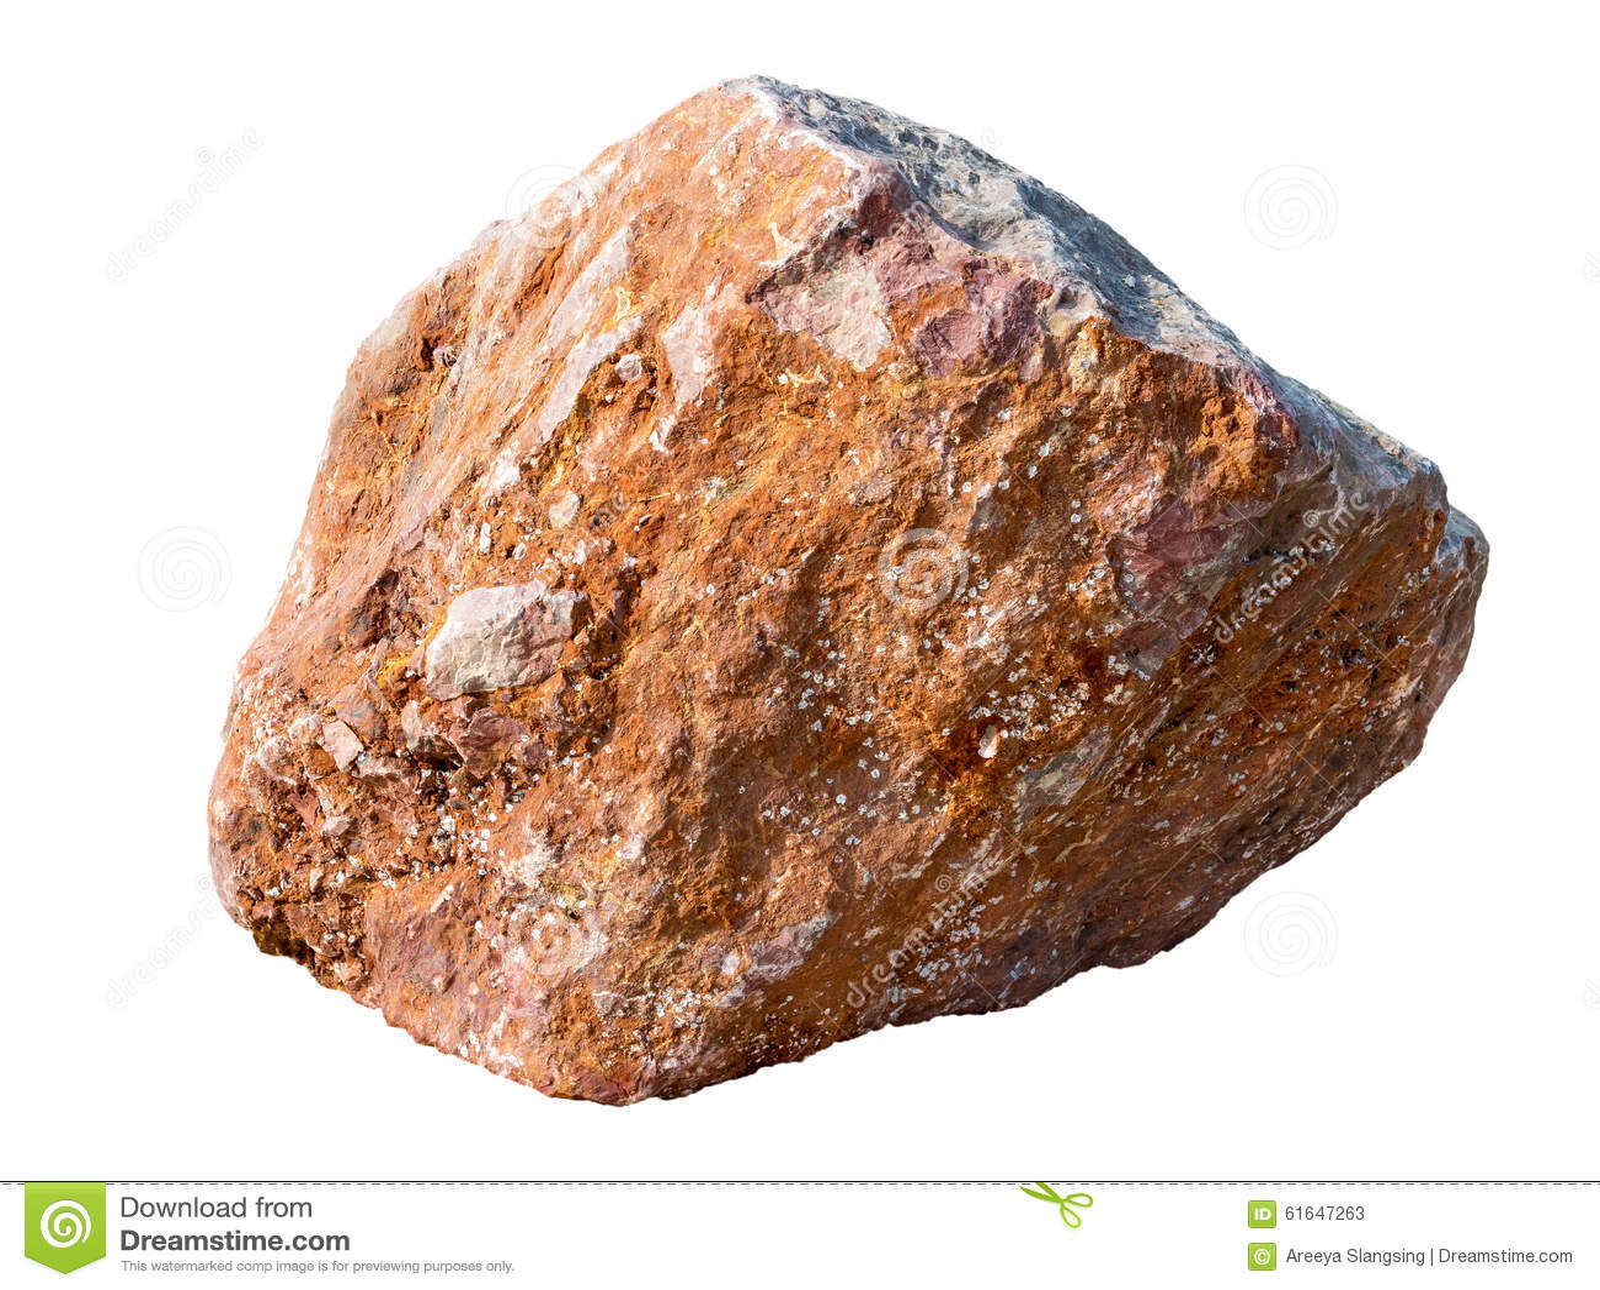 White Granite Background : Big granite rock stone isolated on white stock photo